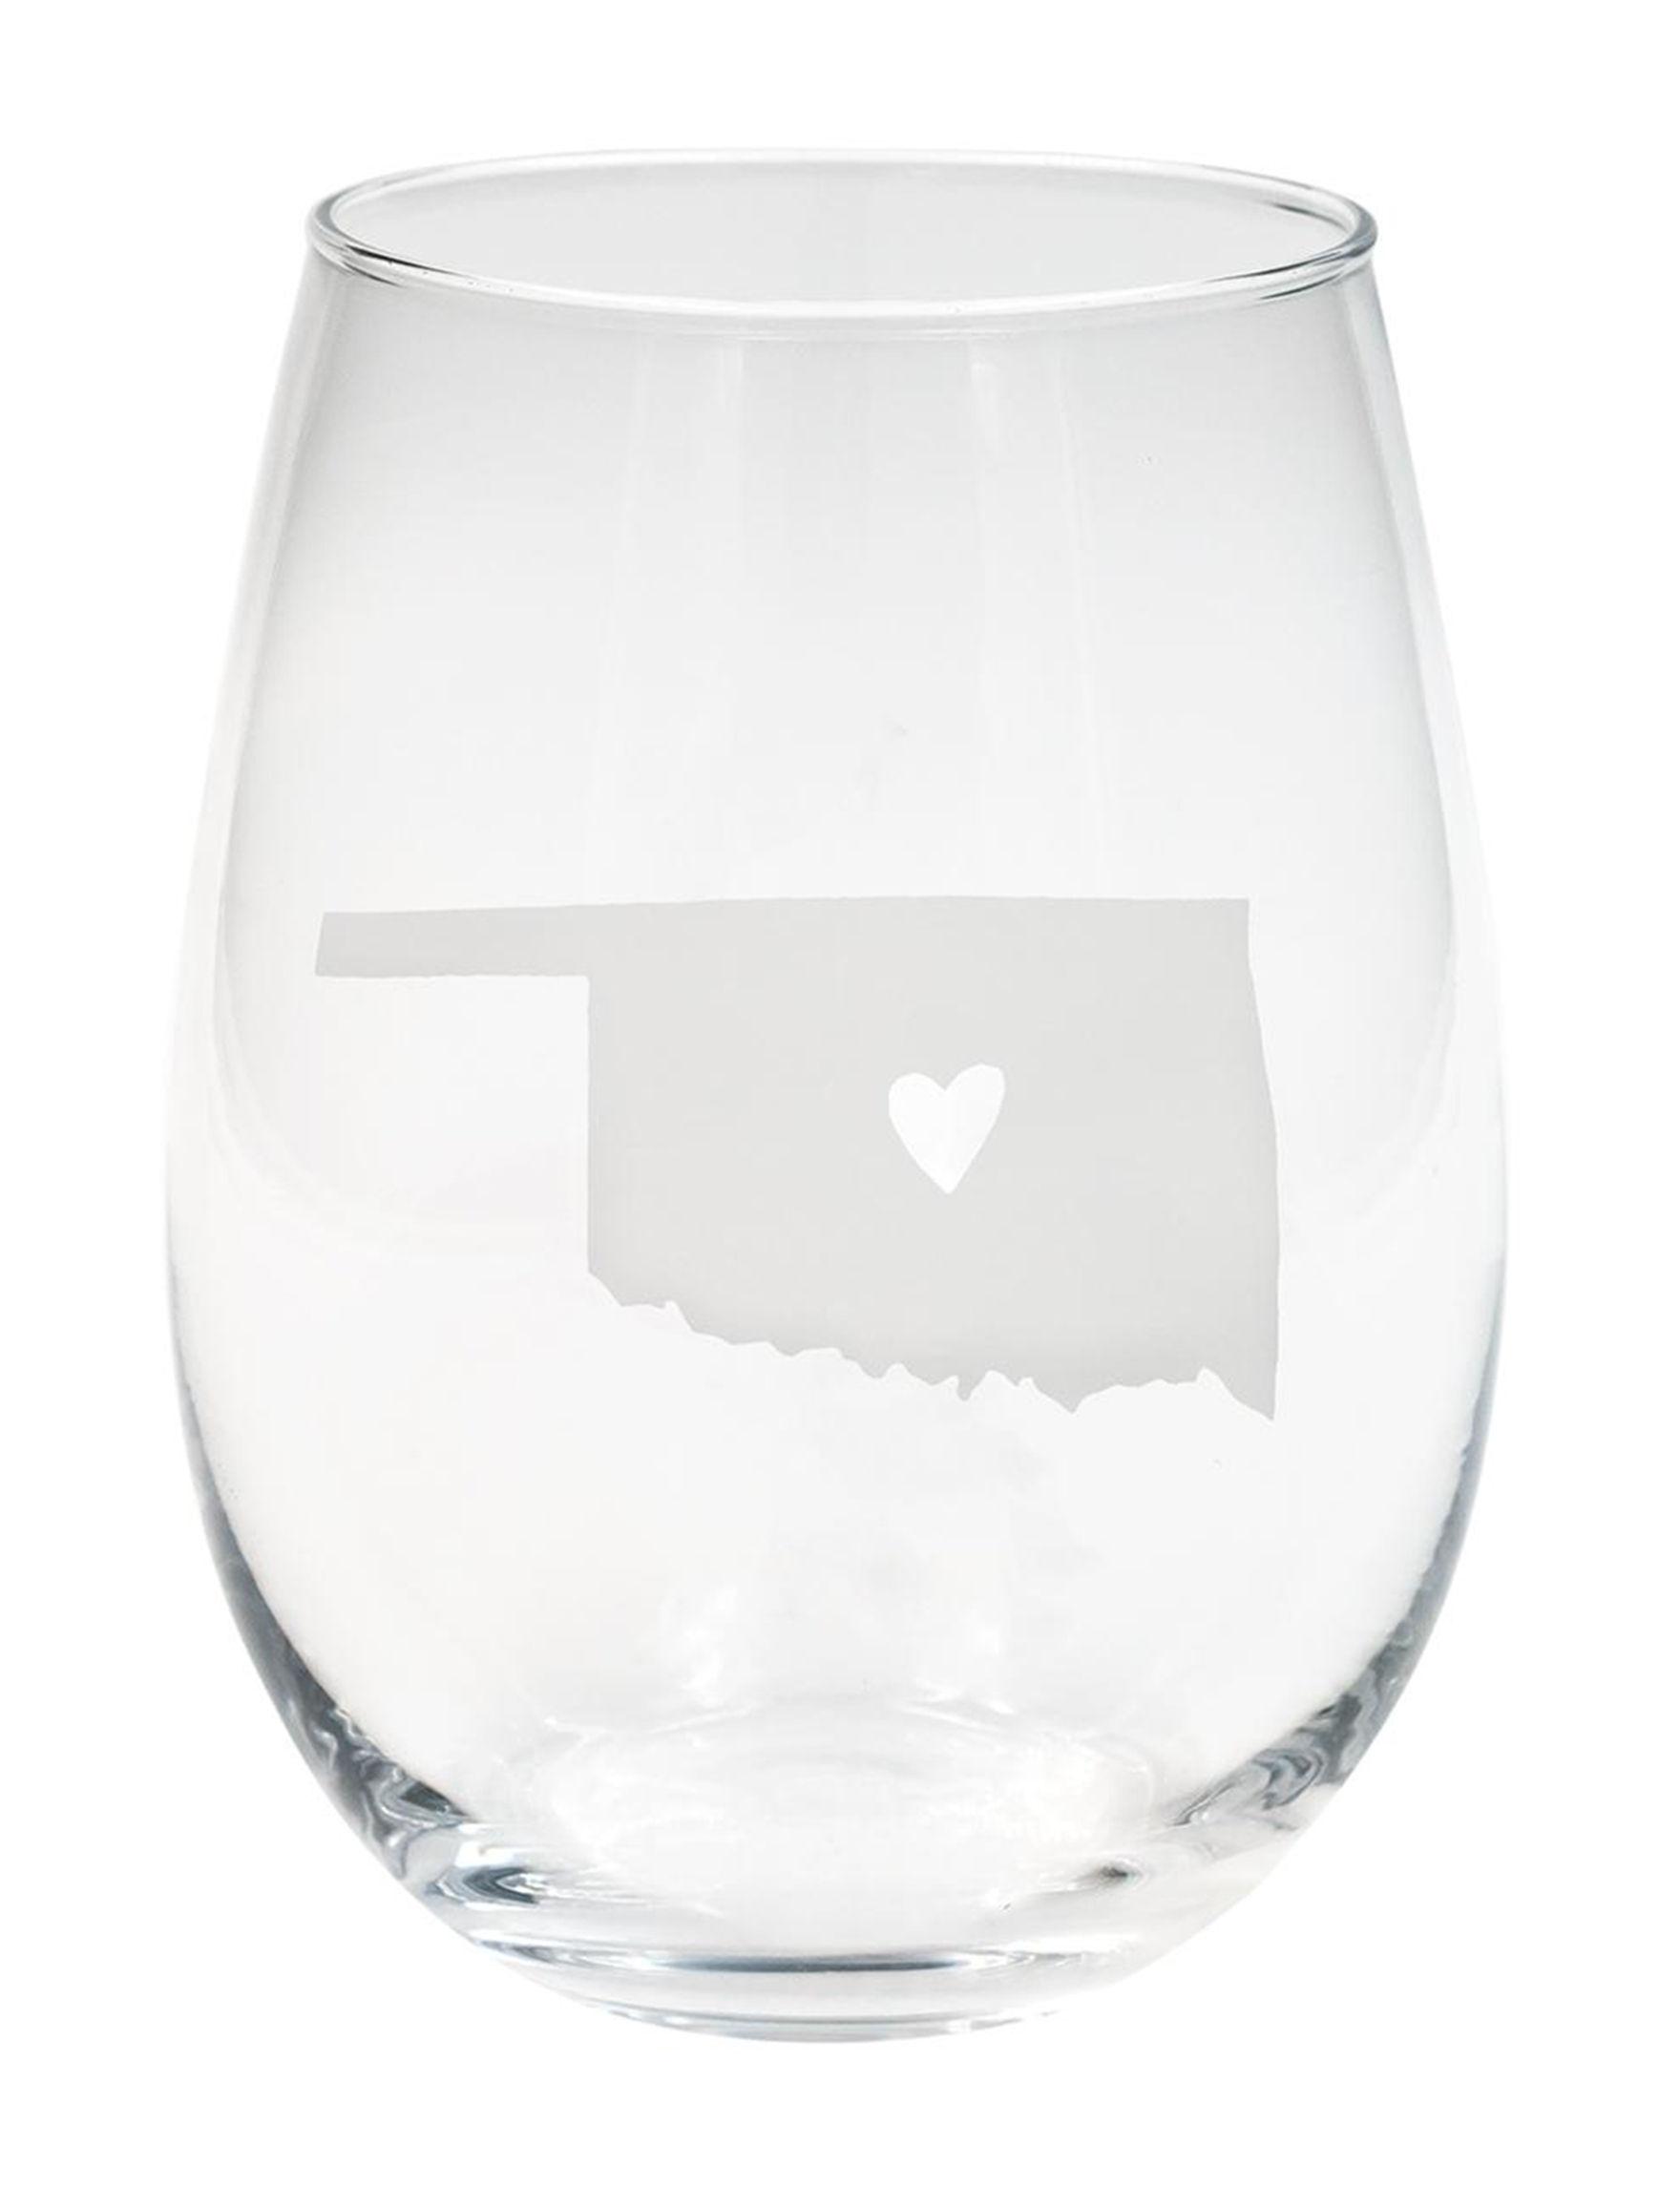 State of Mind  Drinkware Sets Wine Glasses Drinkware